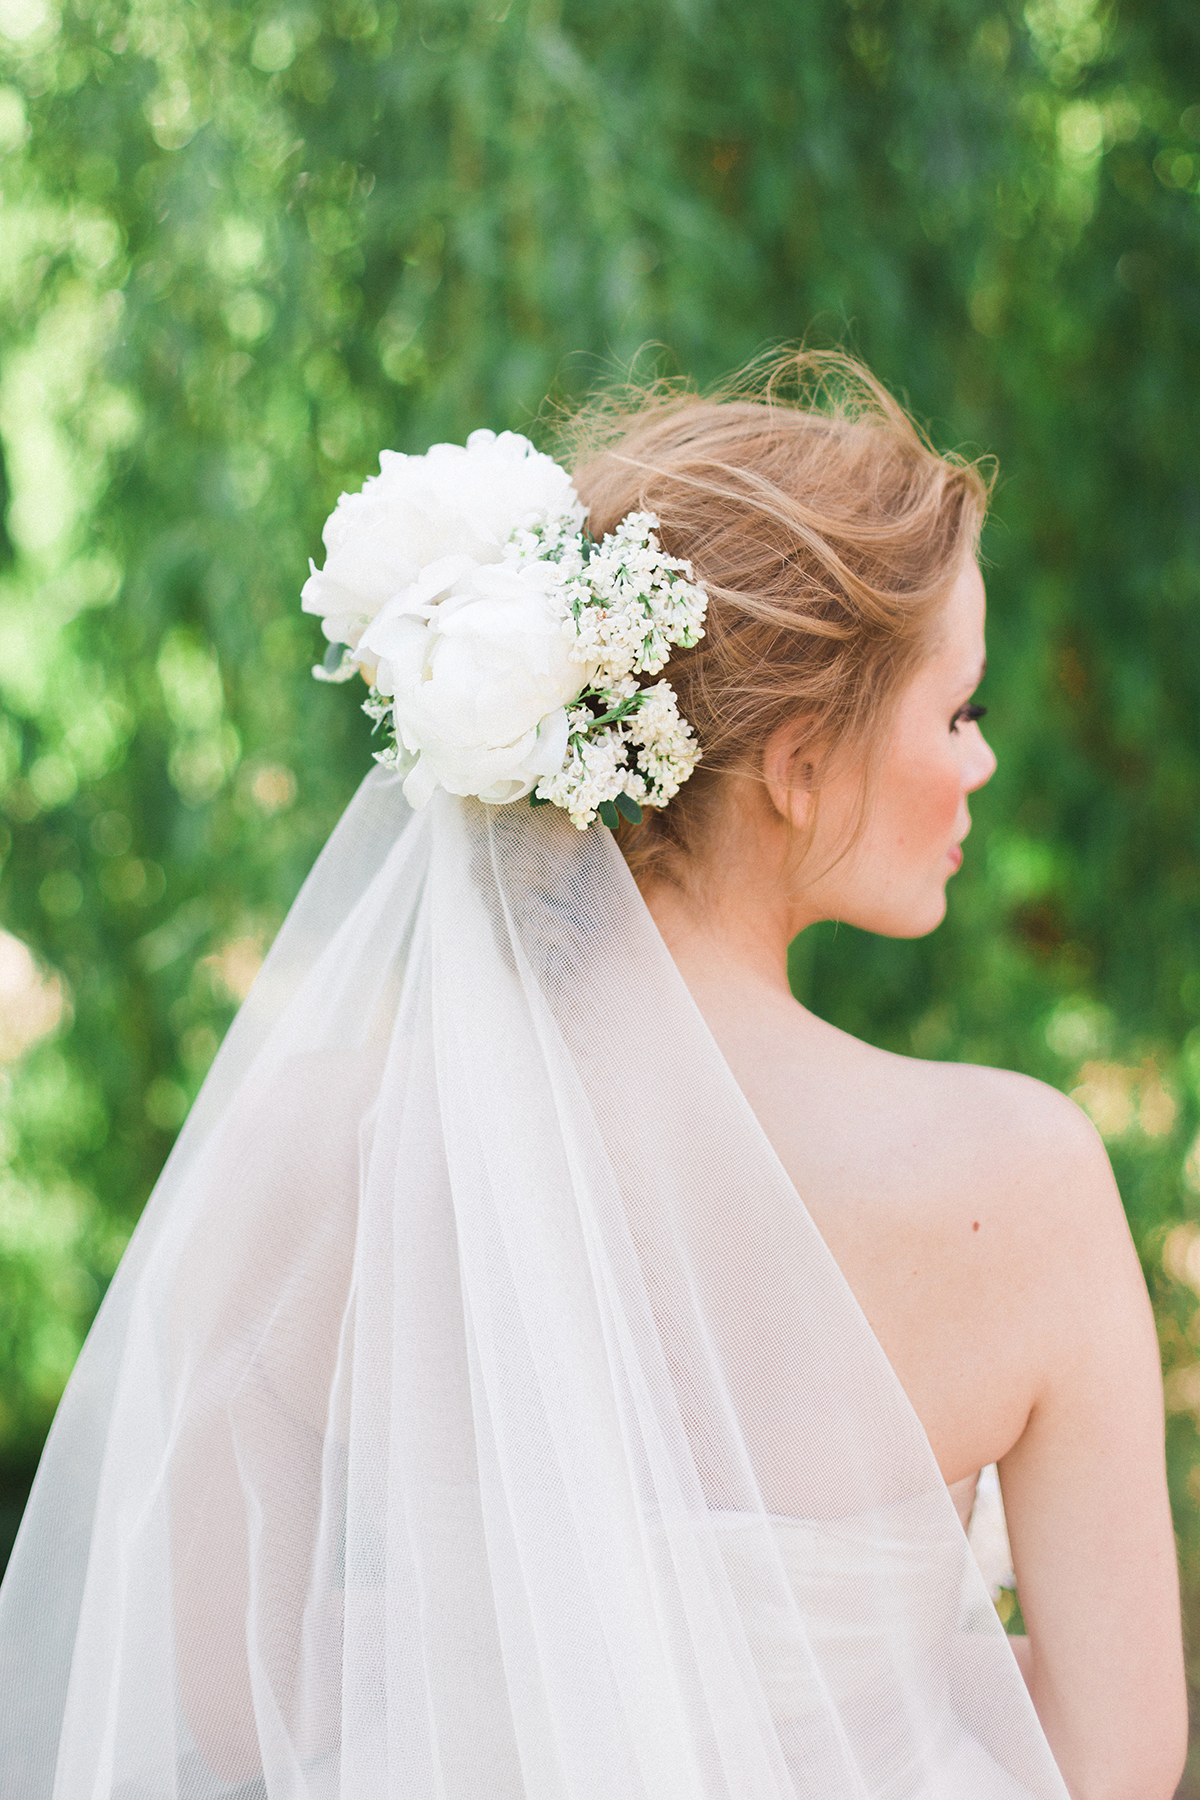 Floral Hair Accessory Bridal Veil